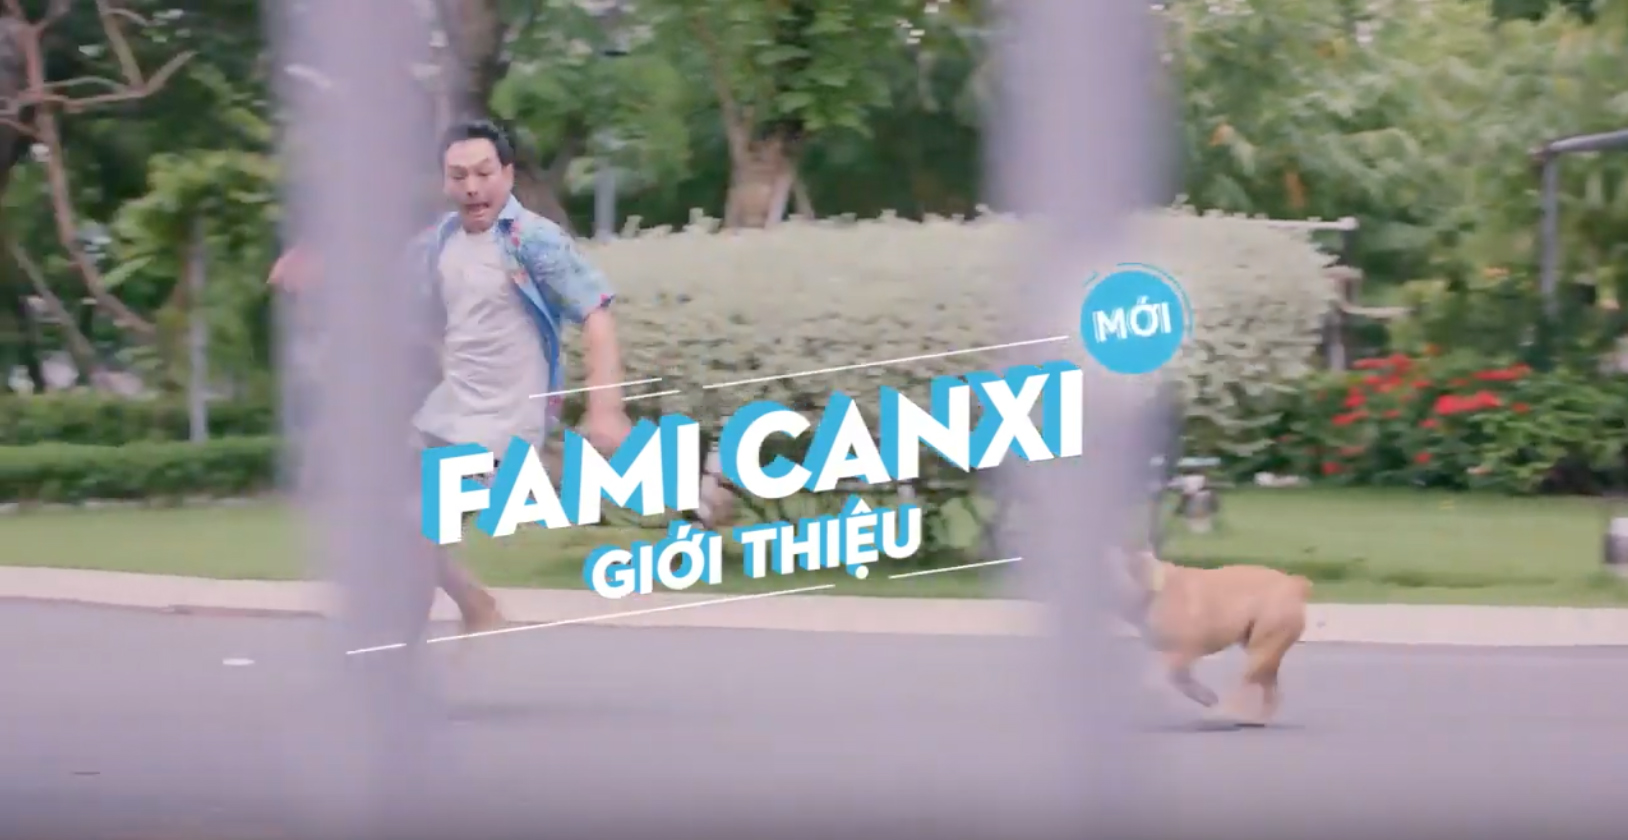 Fami Canxi 2019